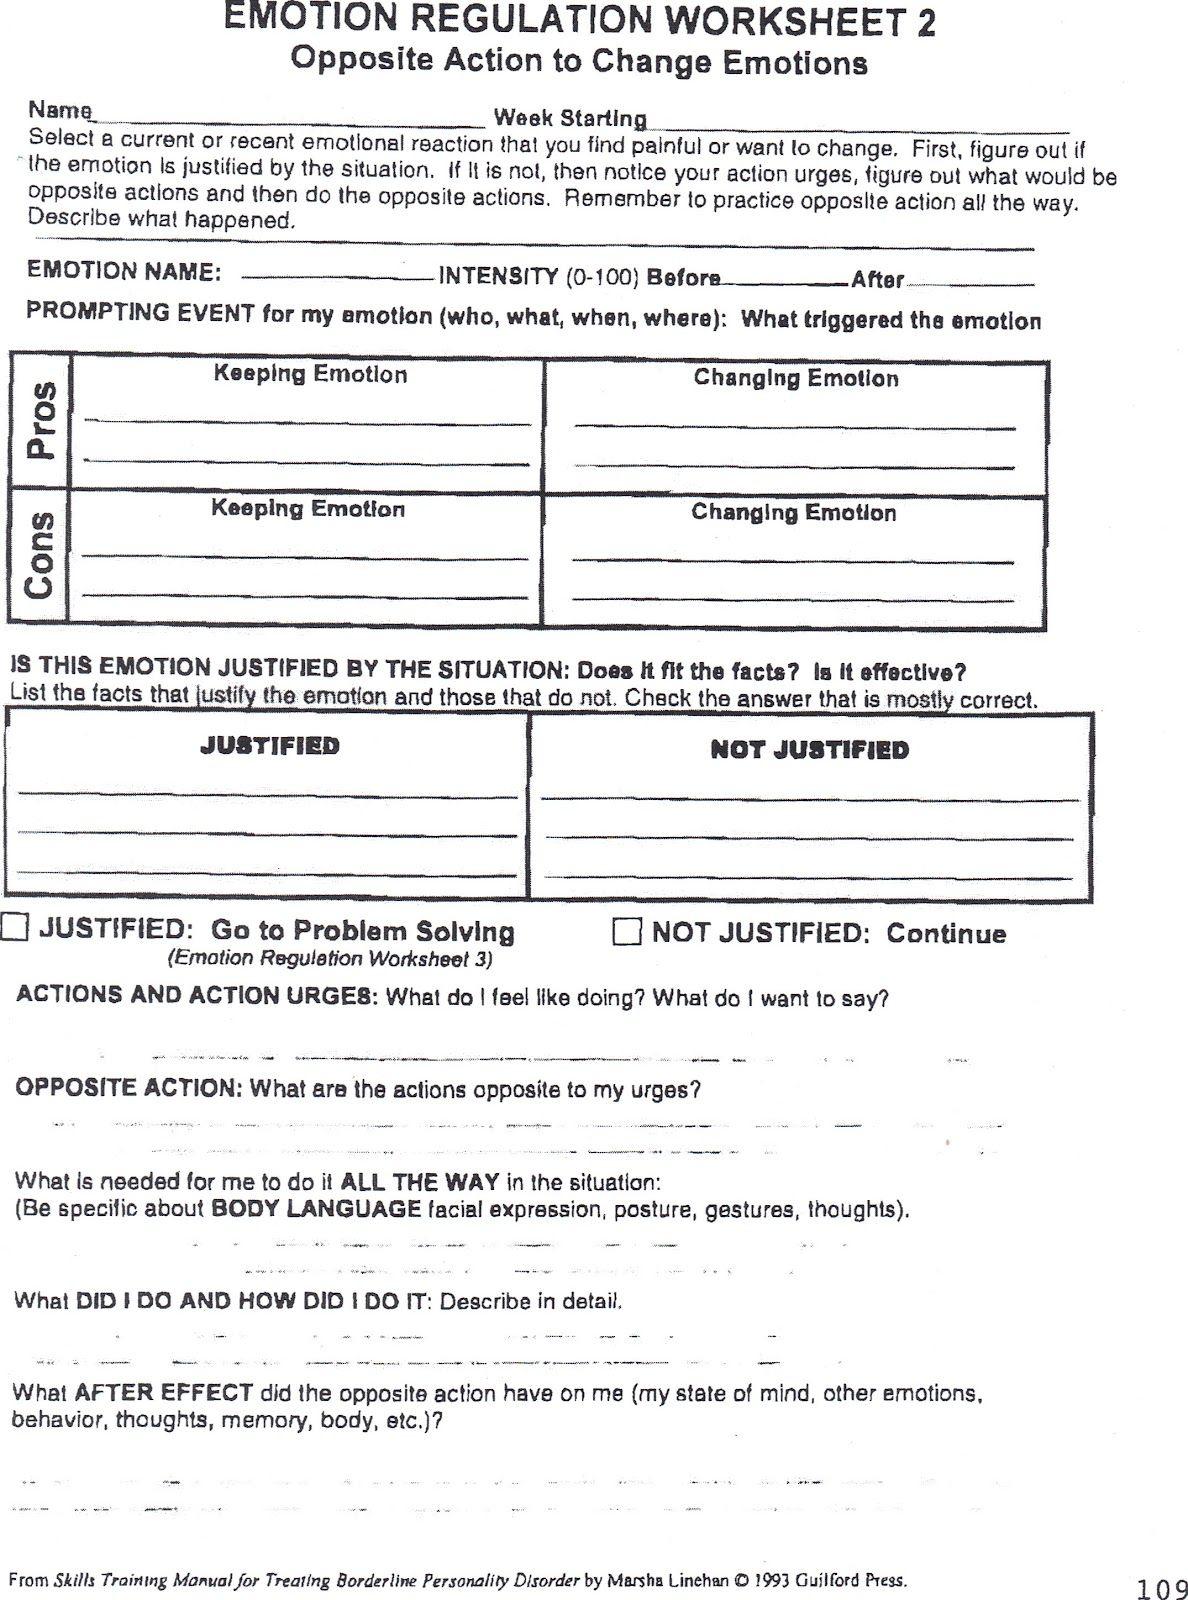 Impulse Control Disorder Treatment Worksheets - Google Search | Impulse Control Worksheets Printable